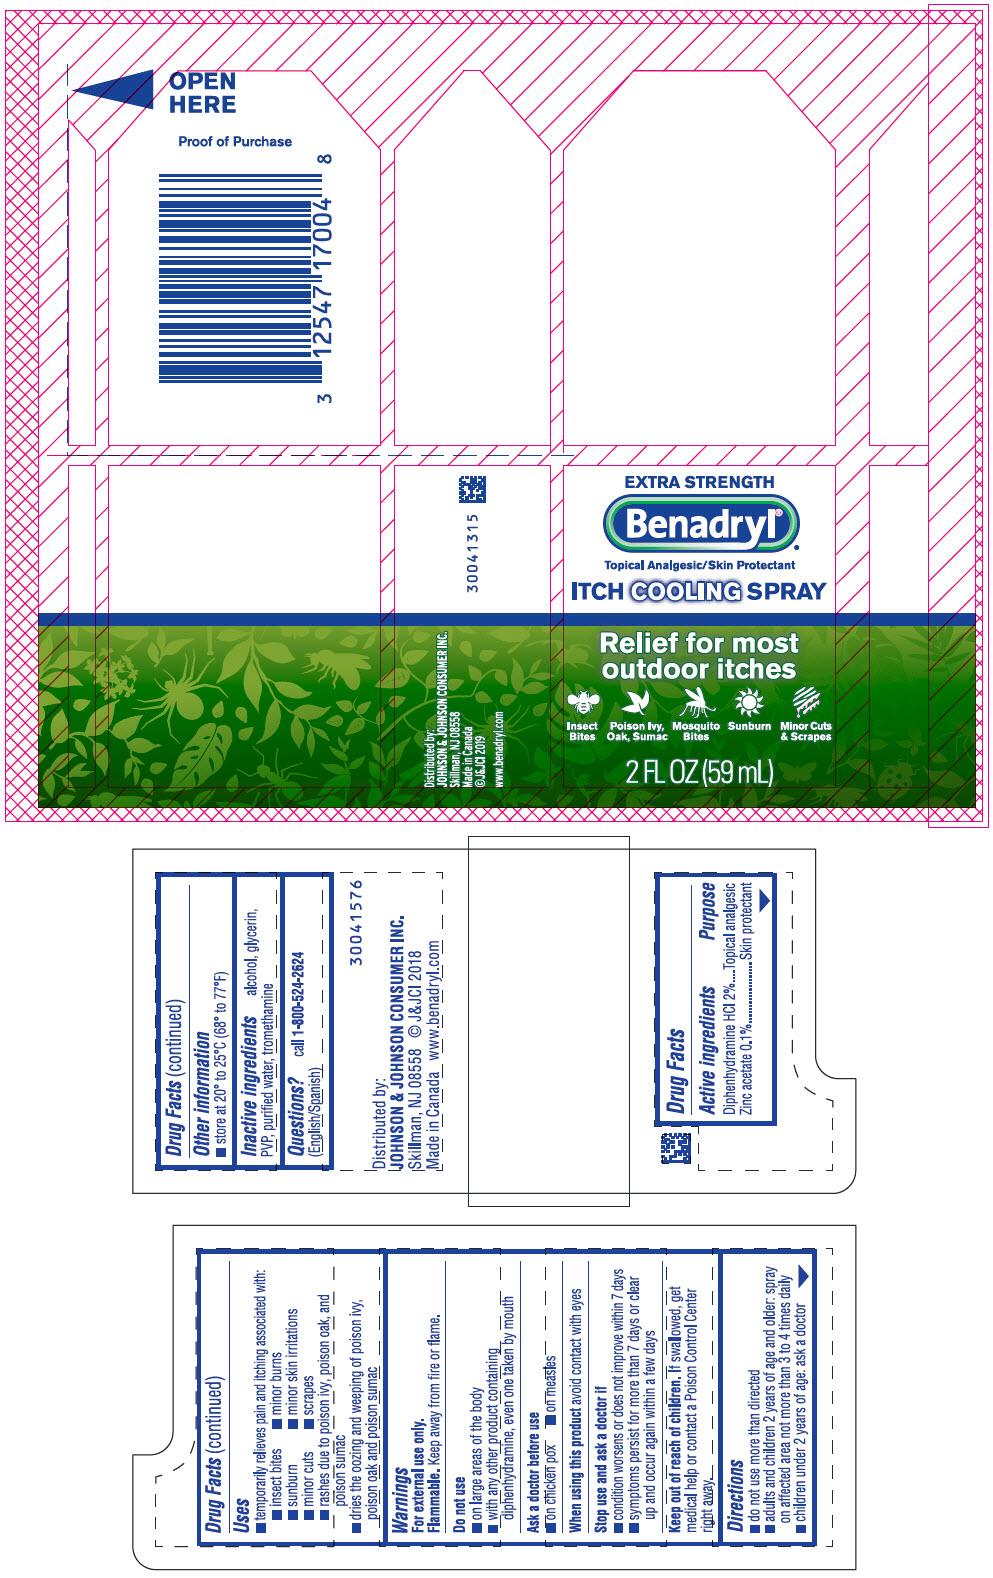 PRINCIPAL DISPLAY PANEL - 59 mL Bottle Label